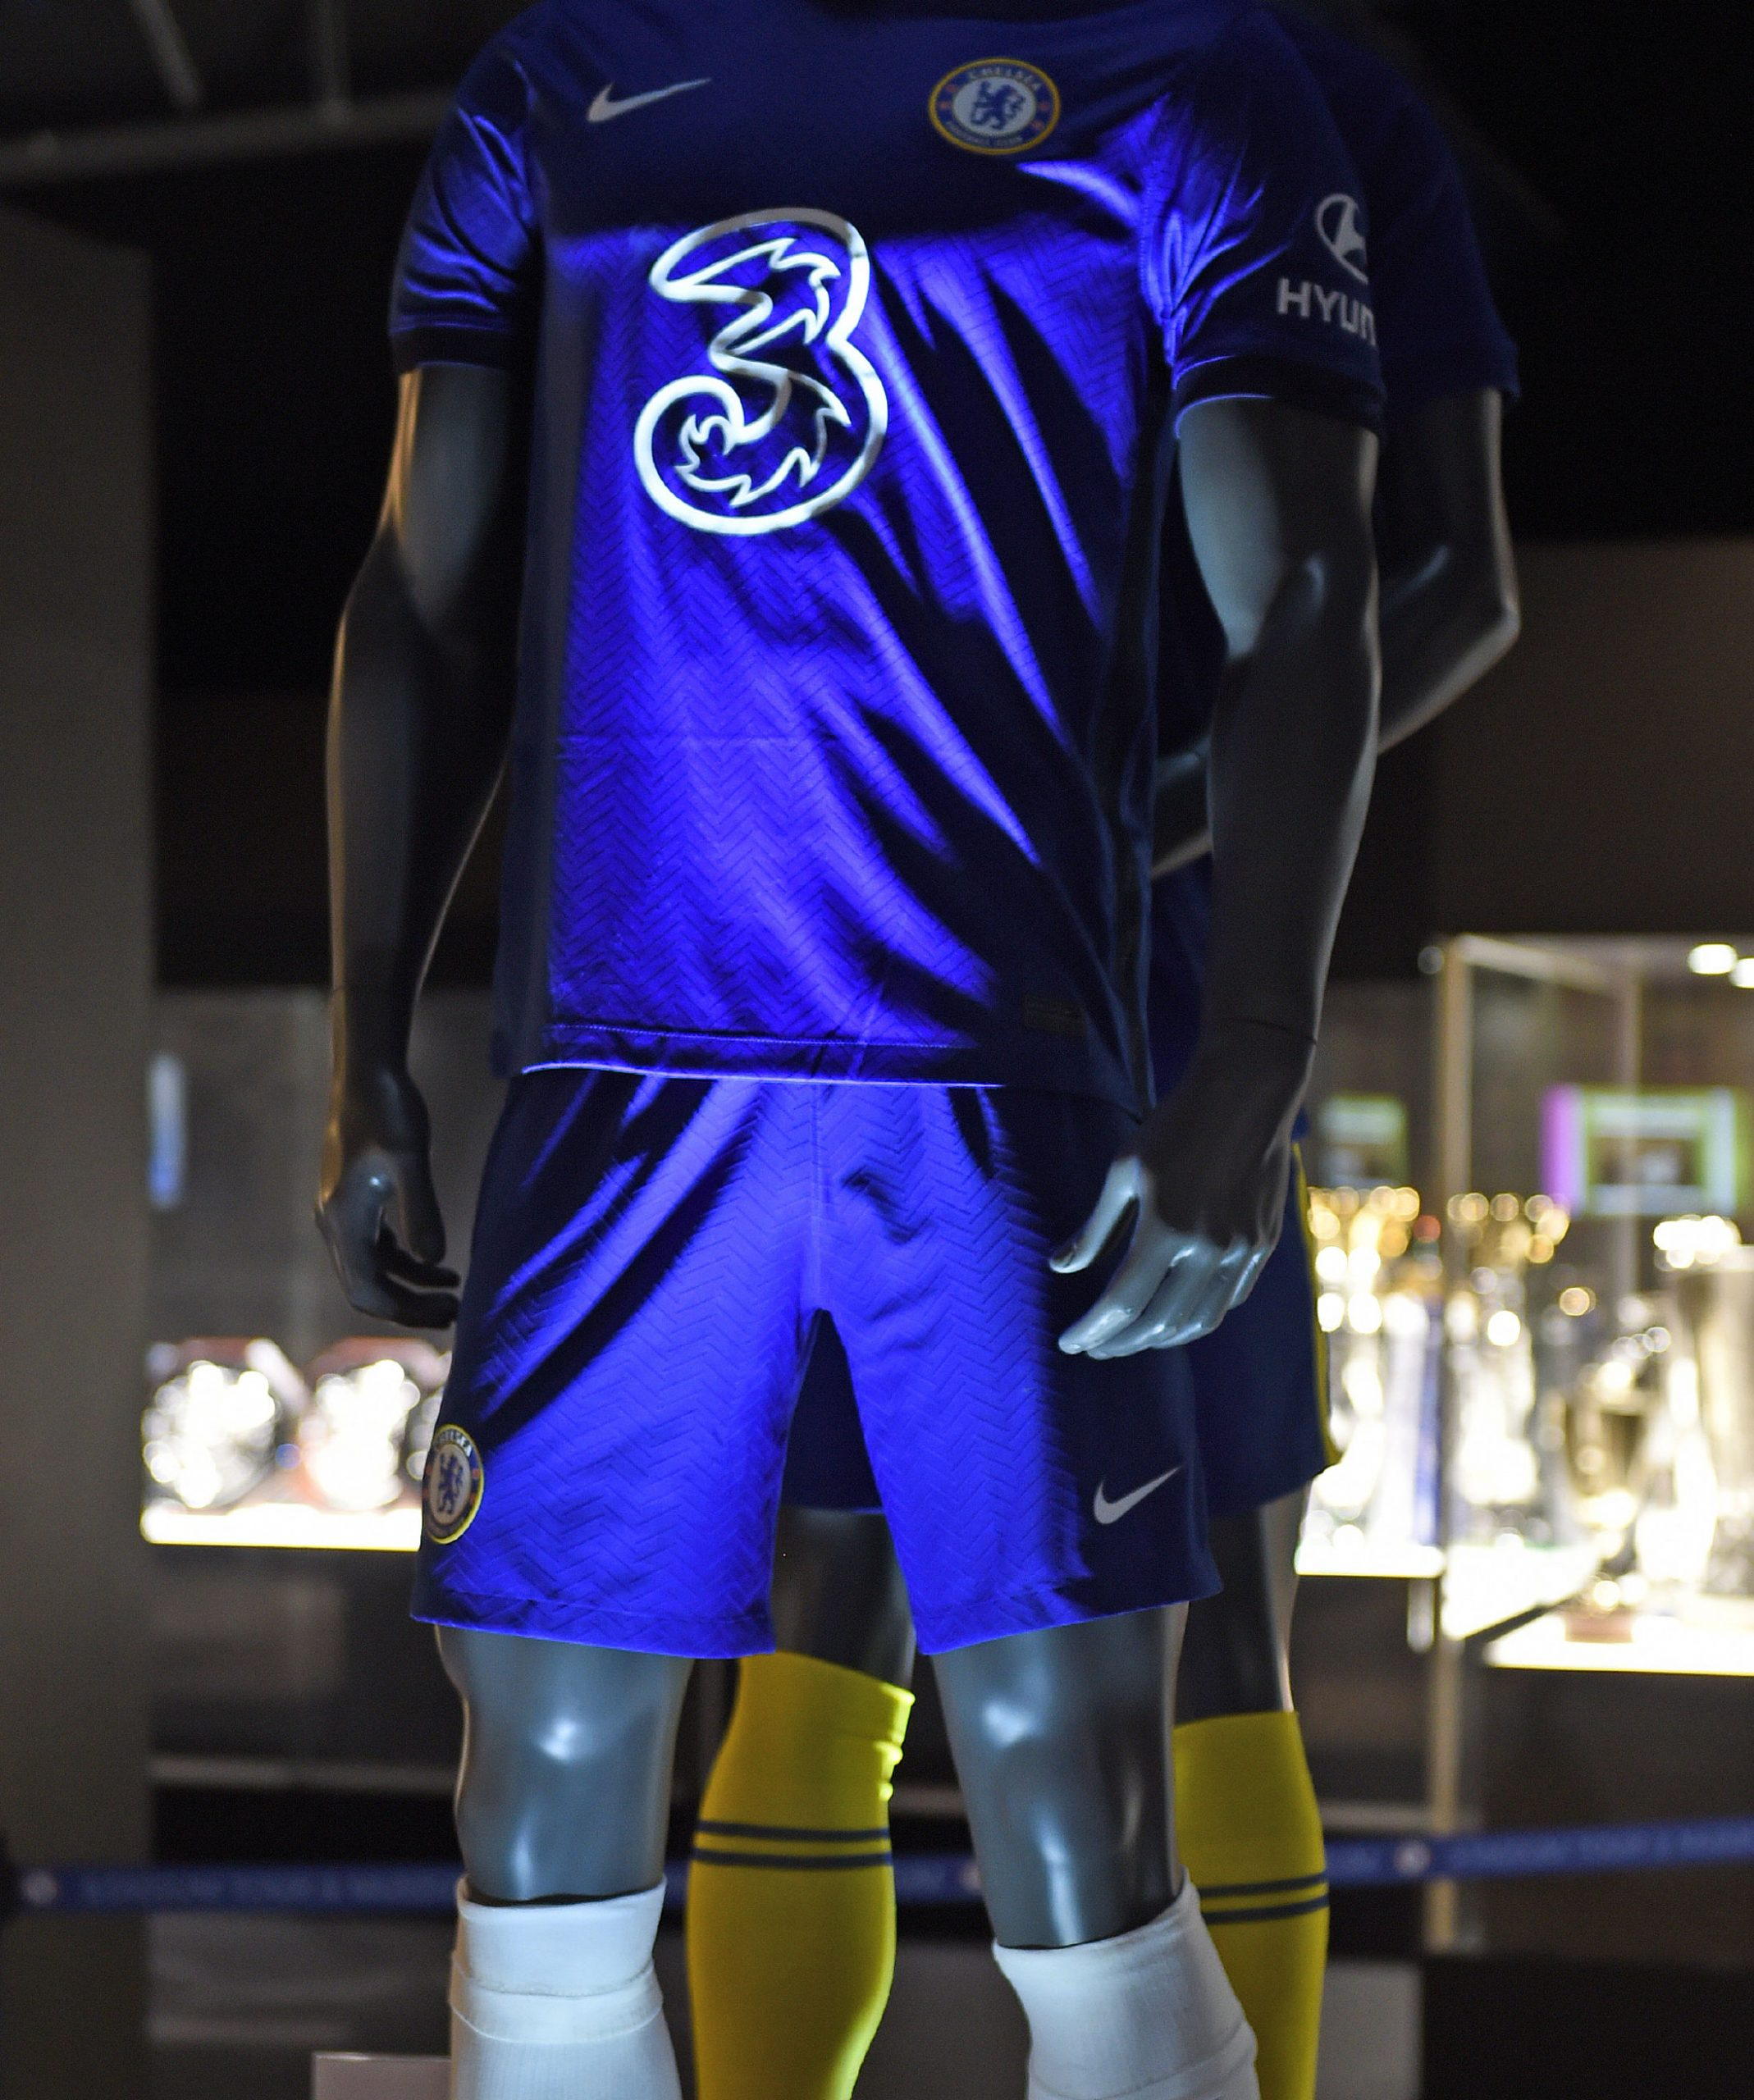 Chelsea 3 kit display